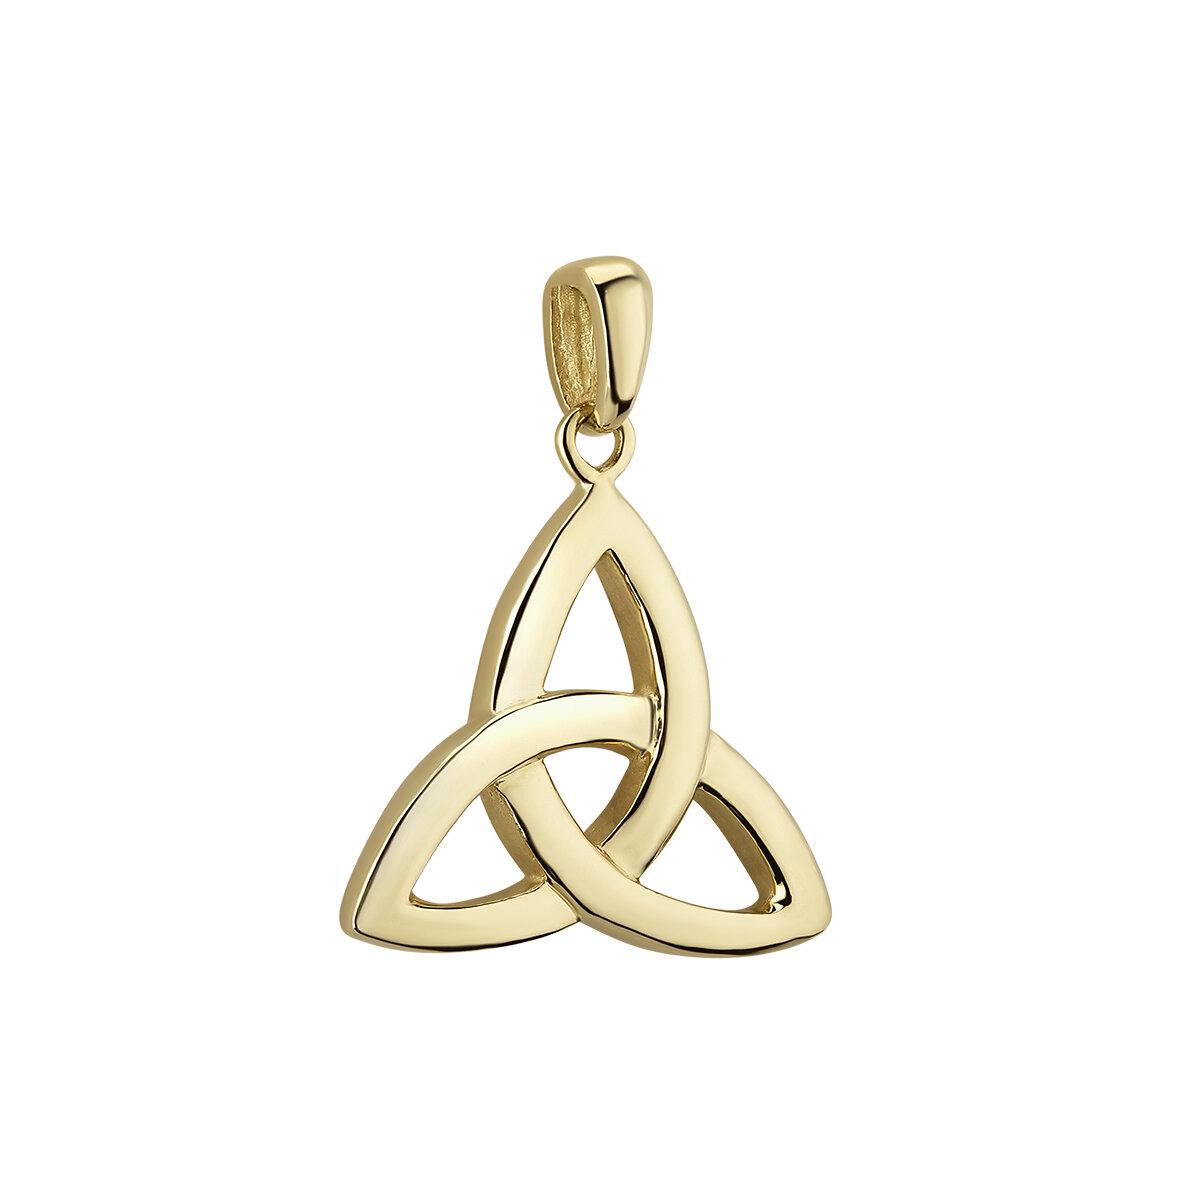 14k gold small trinity knot charm s8768 from Solvar